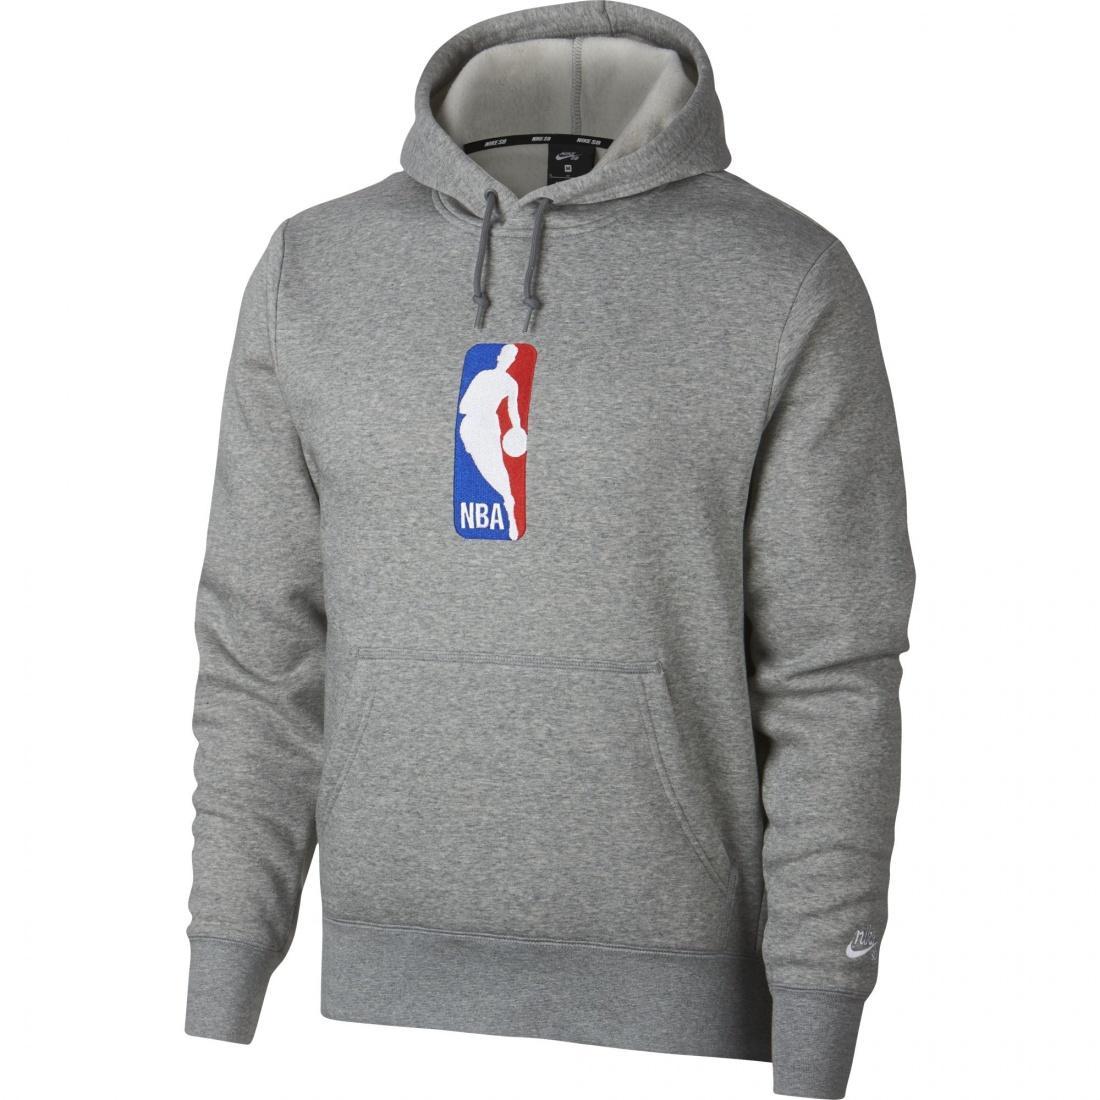 c8b5534e Толстовка Nike SB x NBA Icon купить в интернет-магазине Boardshop №1